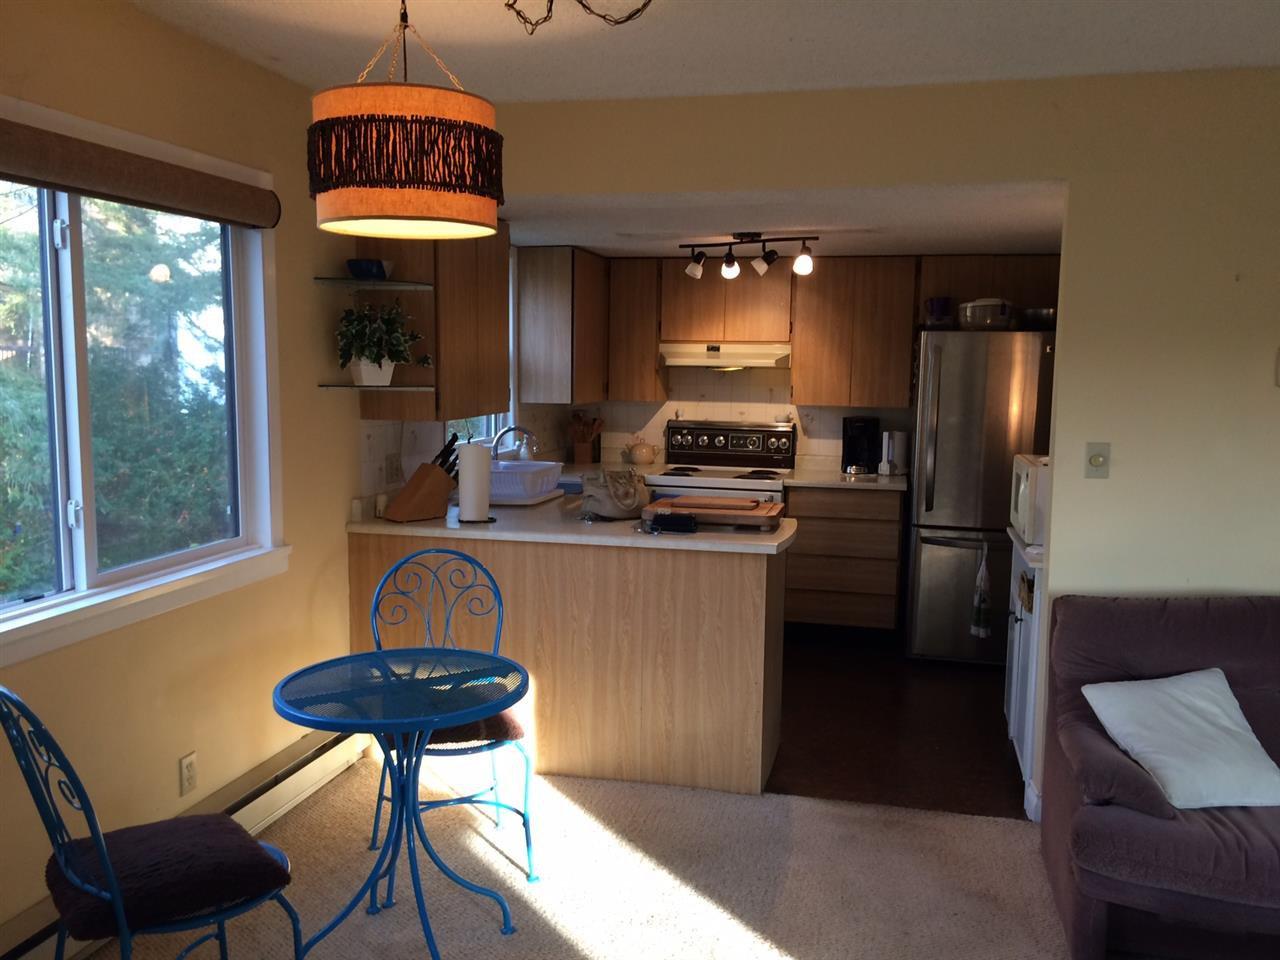 "Photo 4: Photos: 204 7150 133 Street in Surrey: West Newton Condo for sale in ""Suncreek Estates"" : MLS®# R2321410"